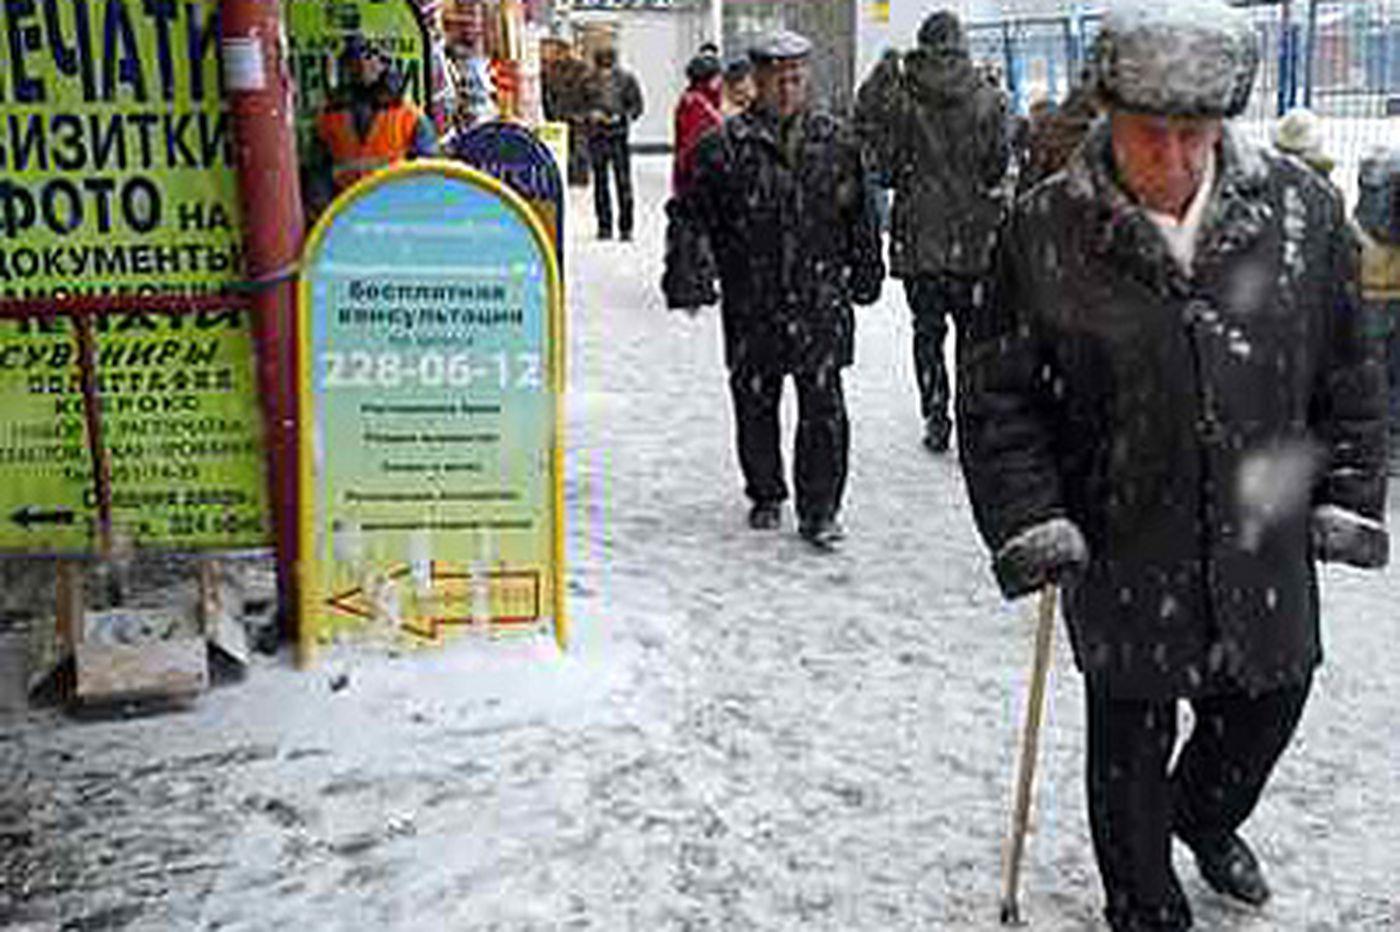 Russian scientists' winter diversion